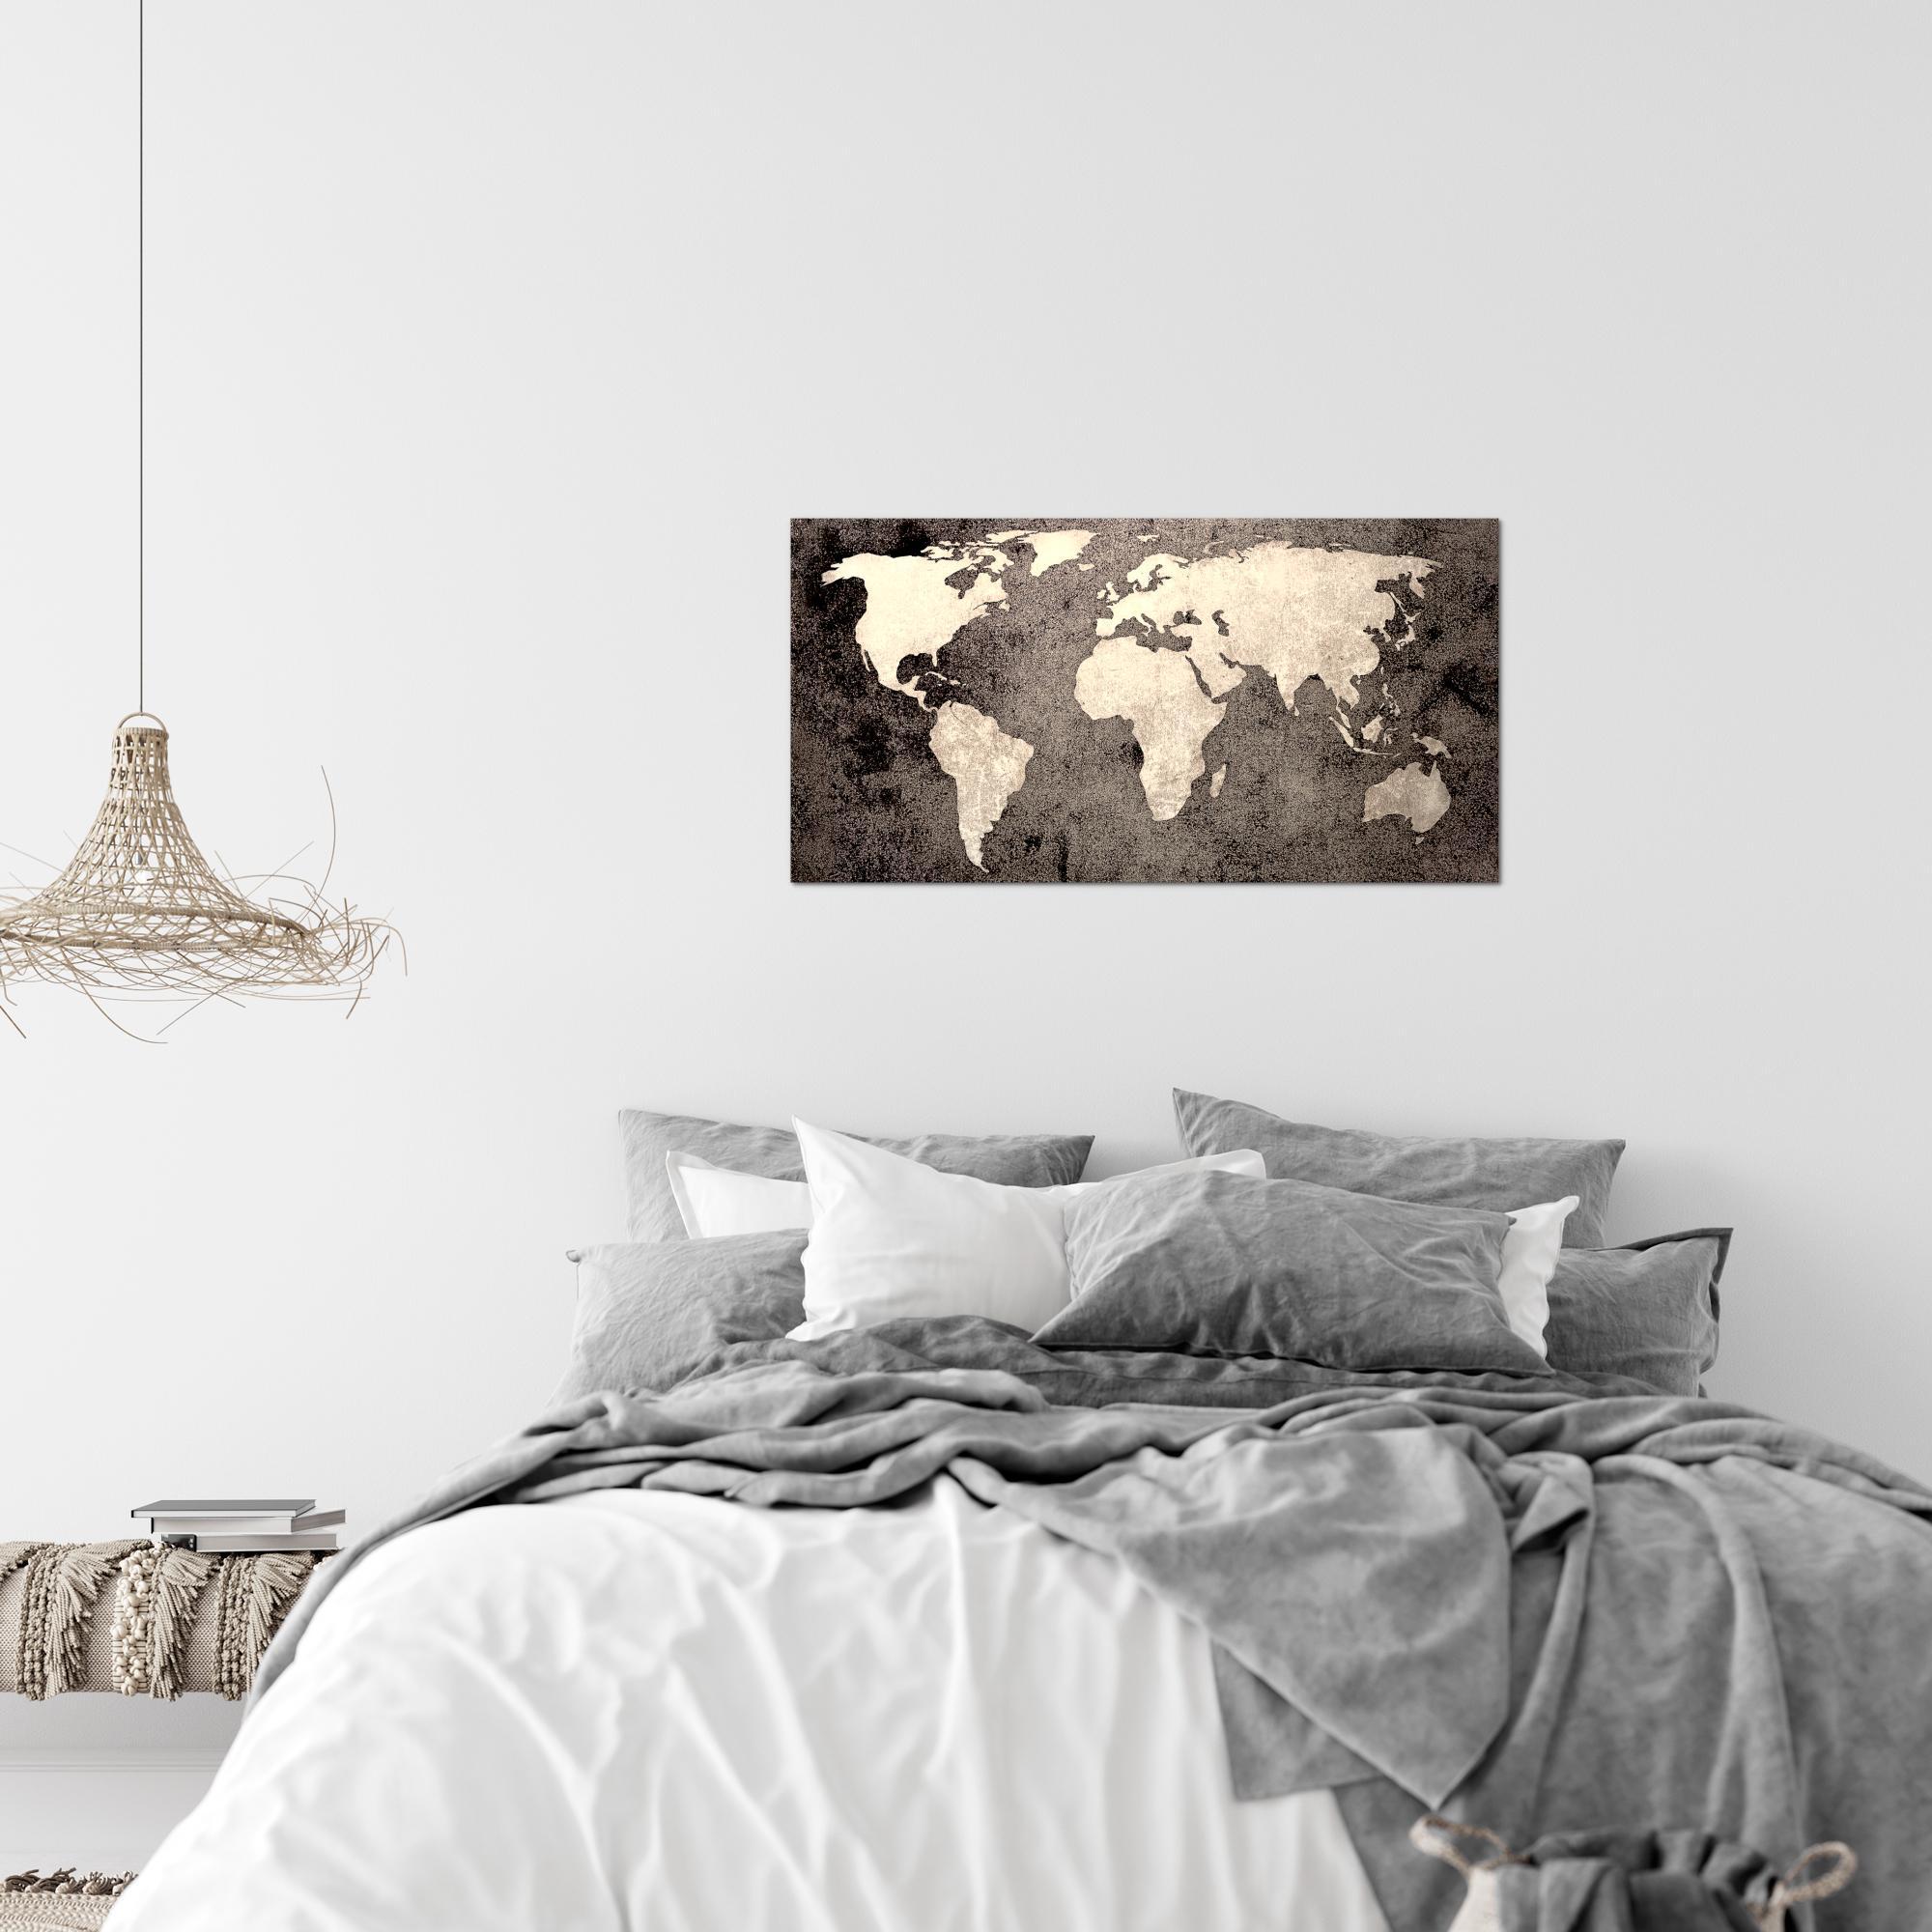 Weltkarte world map bild kunstdruck auf vlies leinwand xxl dekoration 101714p - Weltkarte bild leinwand ...